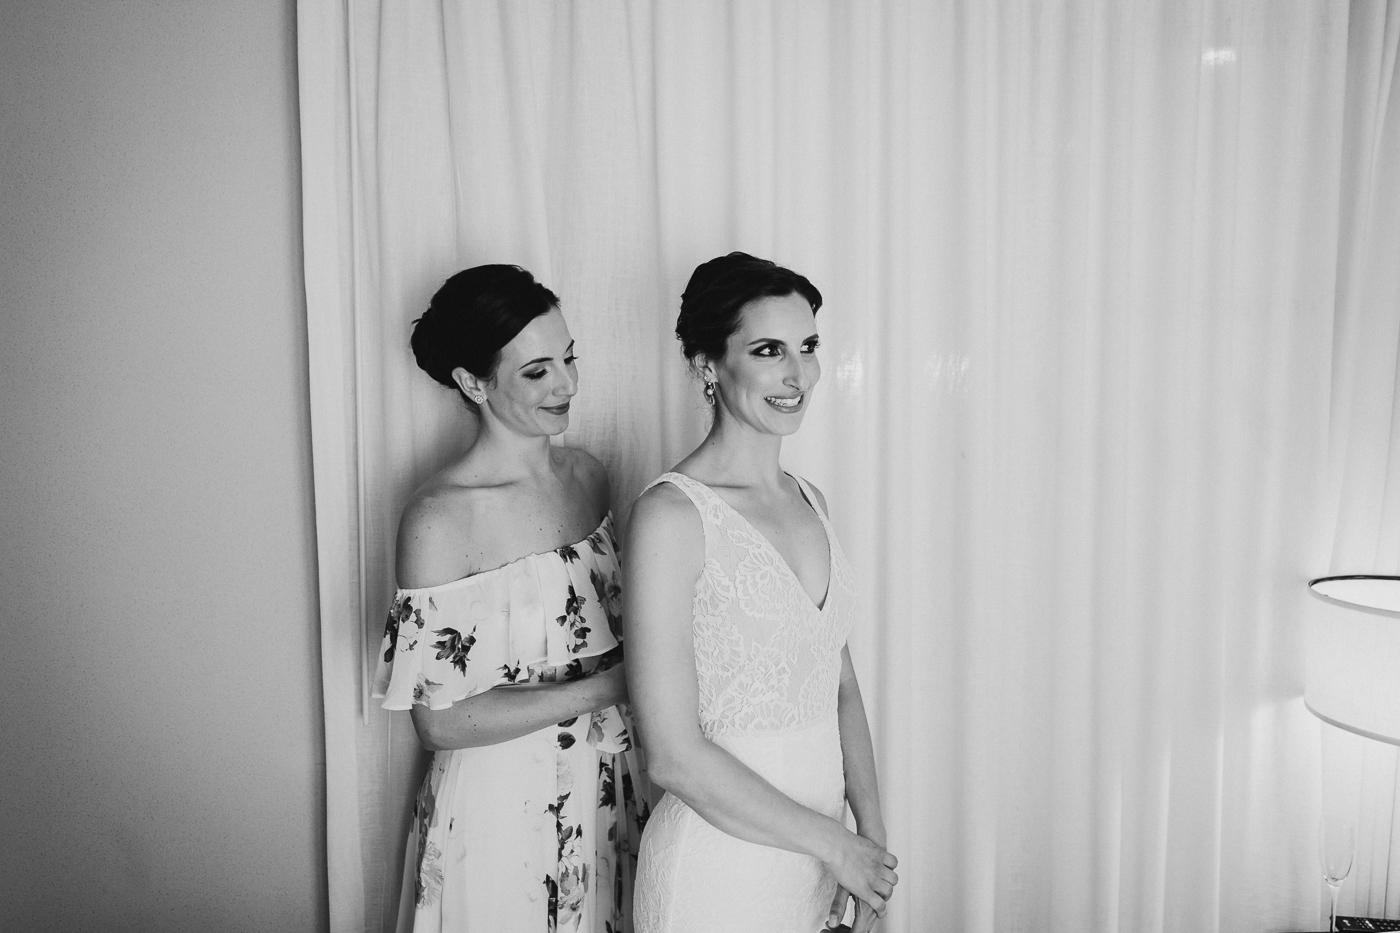 NYC-Central-Park-Conservatory-Garden-Intimate-Elopement-Documentary-Wedding-Photographer-8.jpg